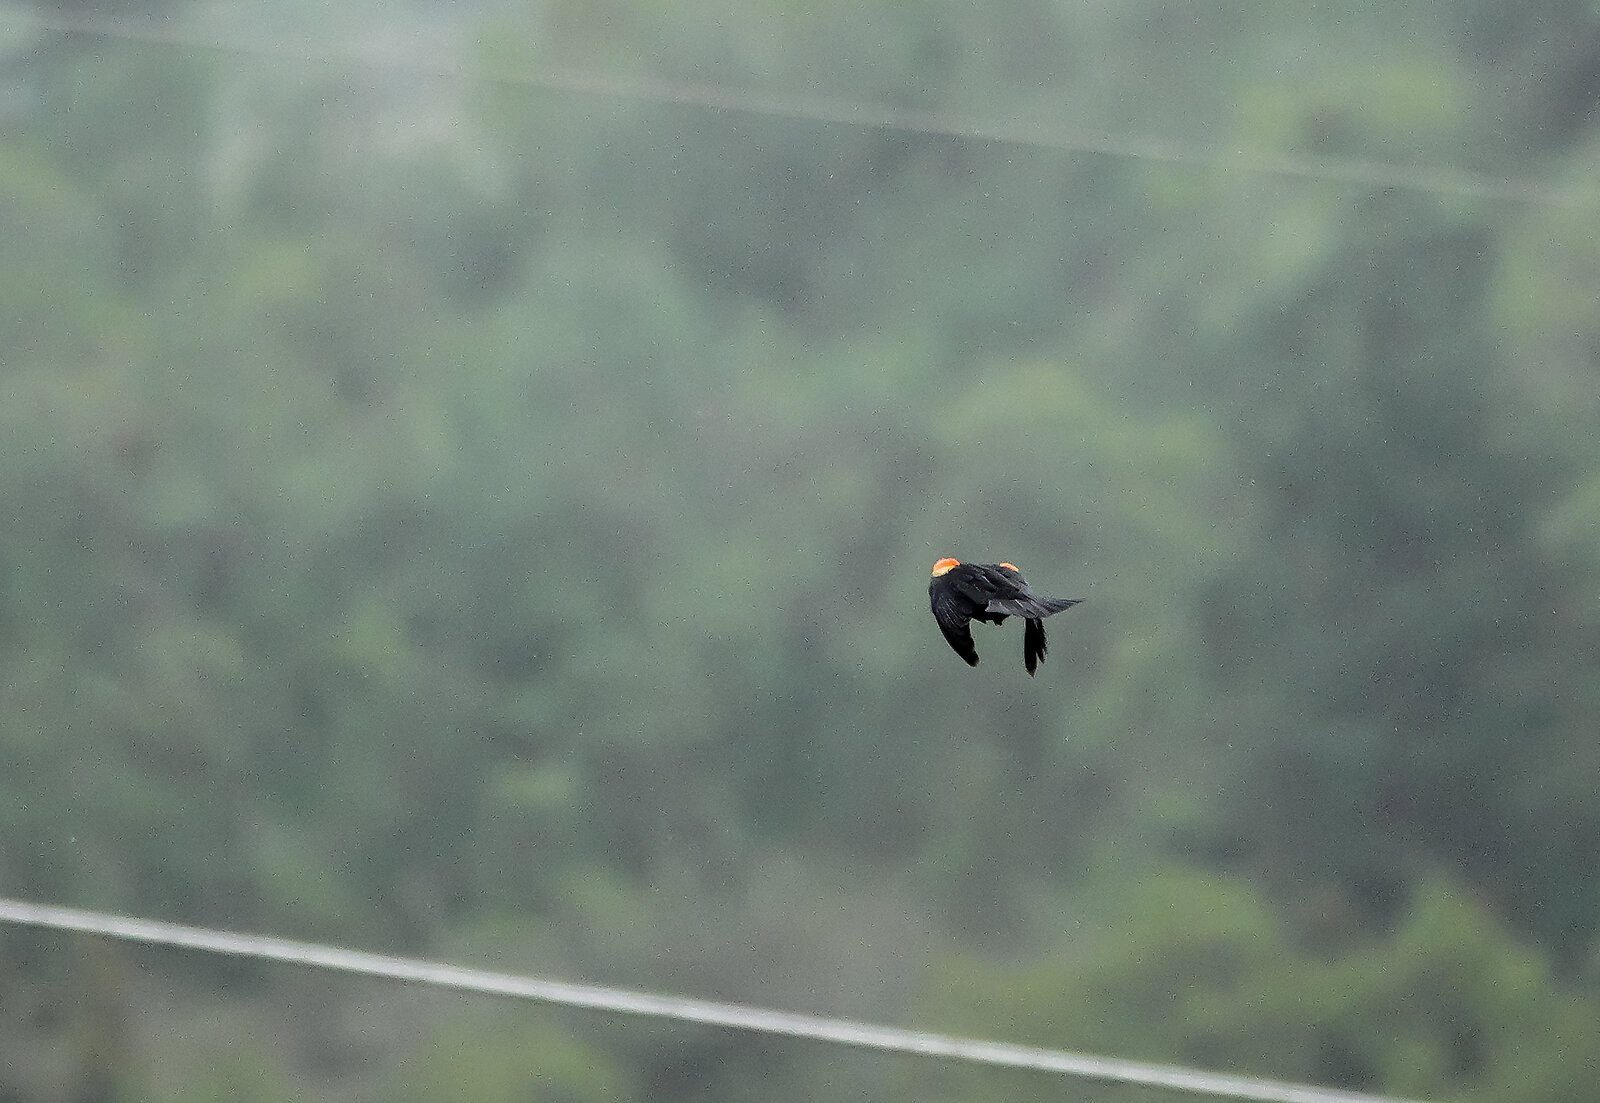 RX10_Apr24_21_blackbird_flying#6.jpg